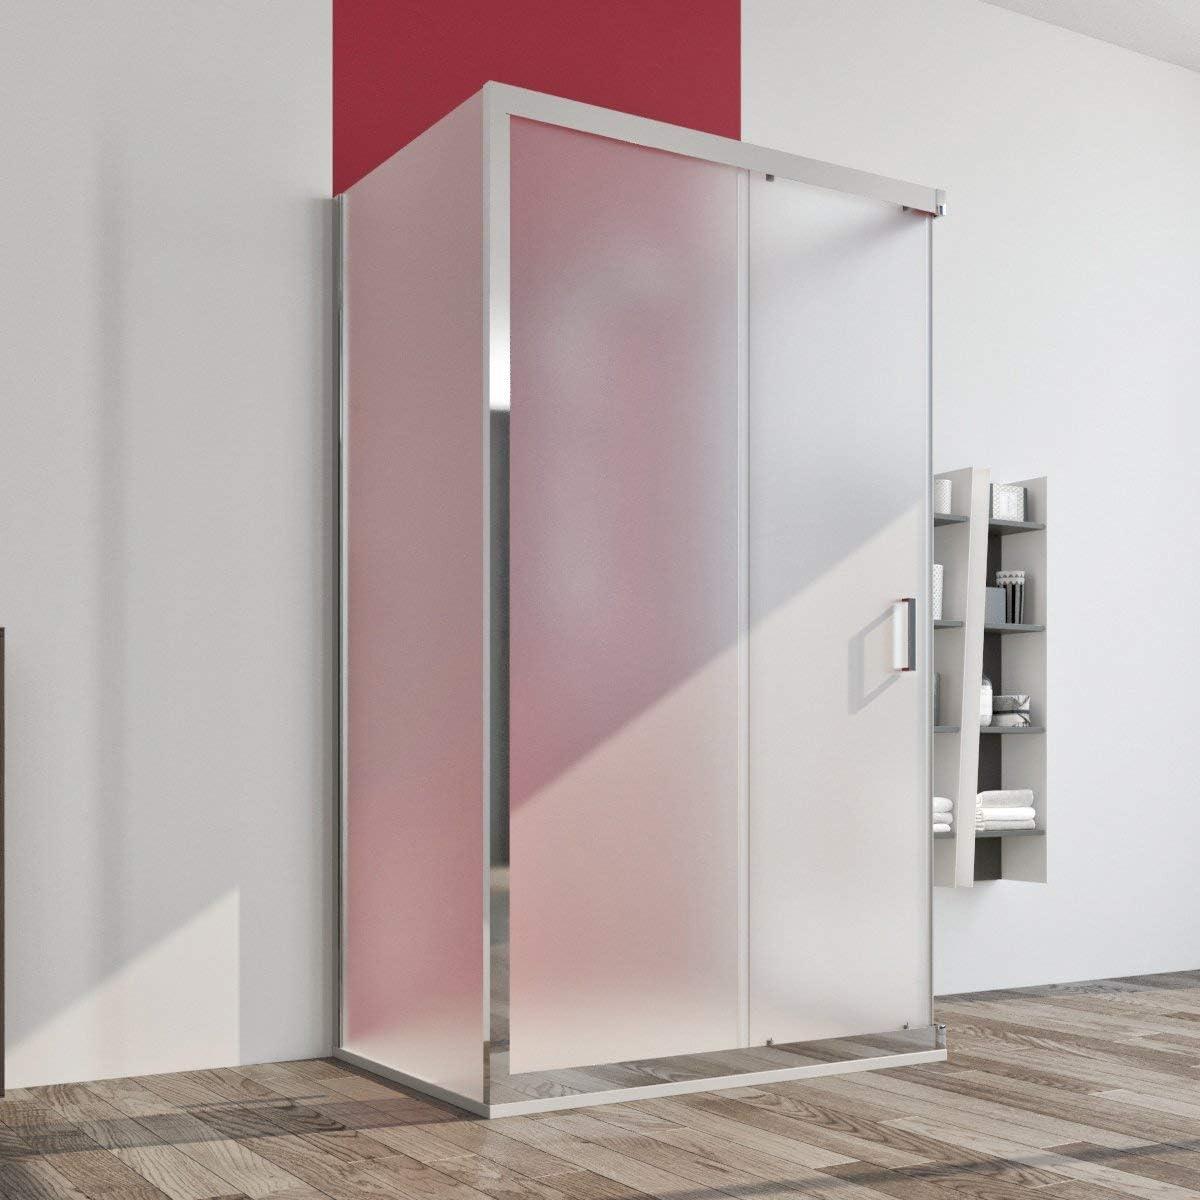 Cabina de ducha 3 lados 80 x 120 x 80 cm puerta corredera cristal ...